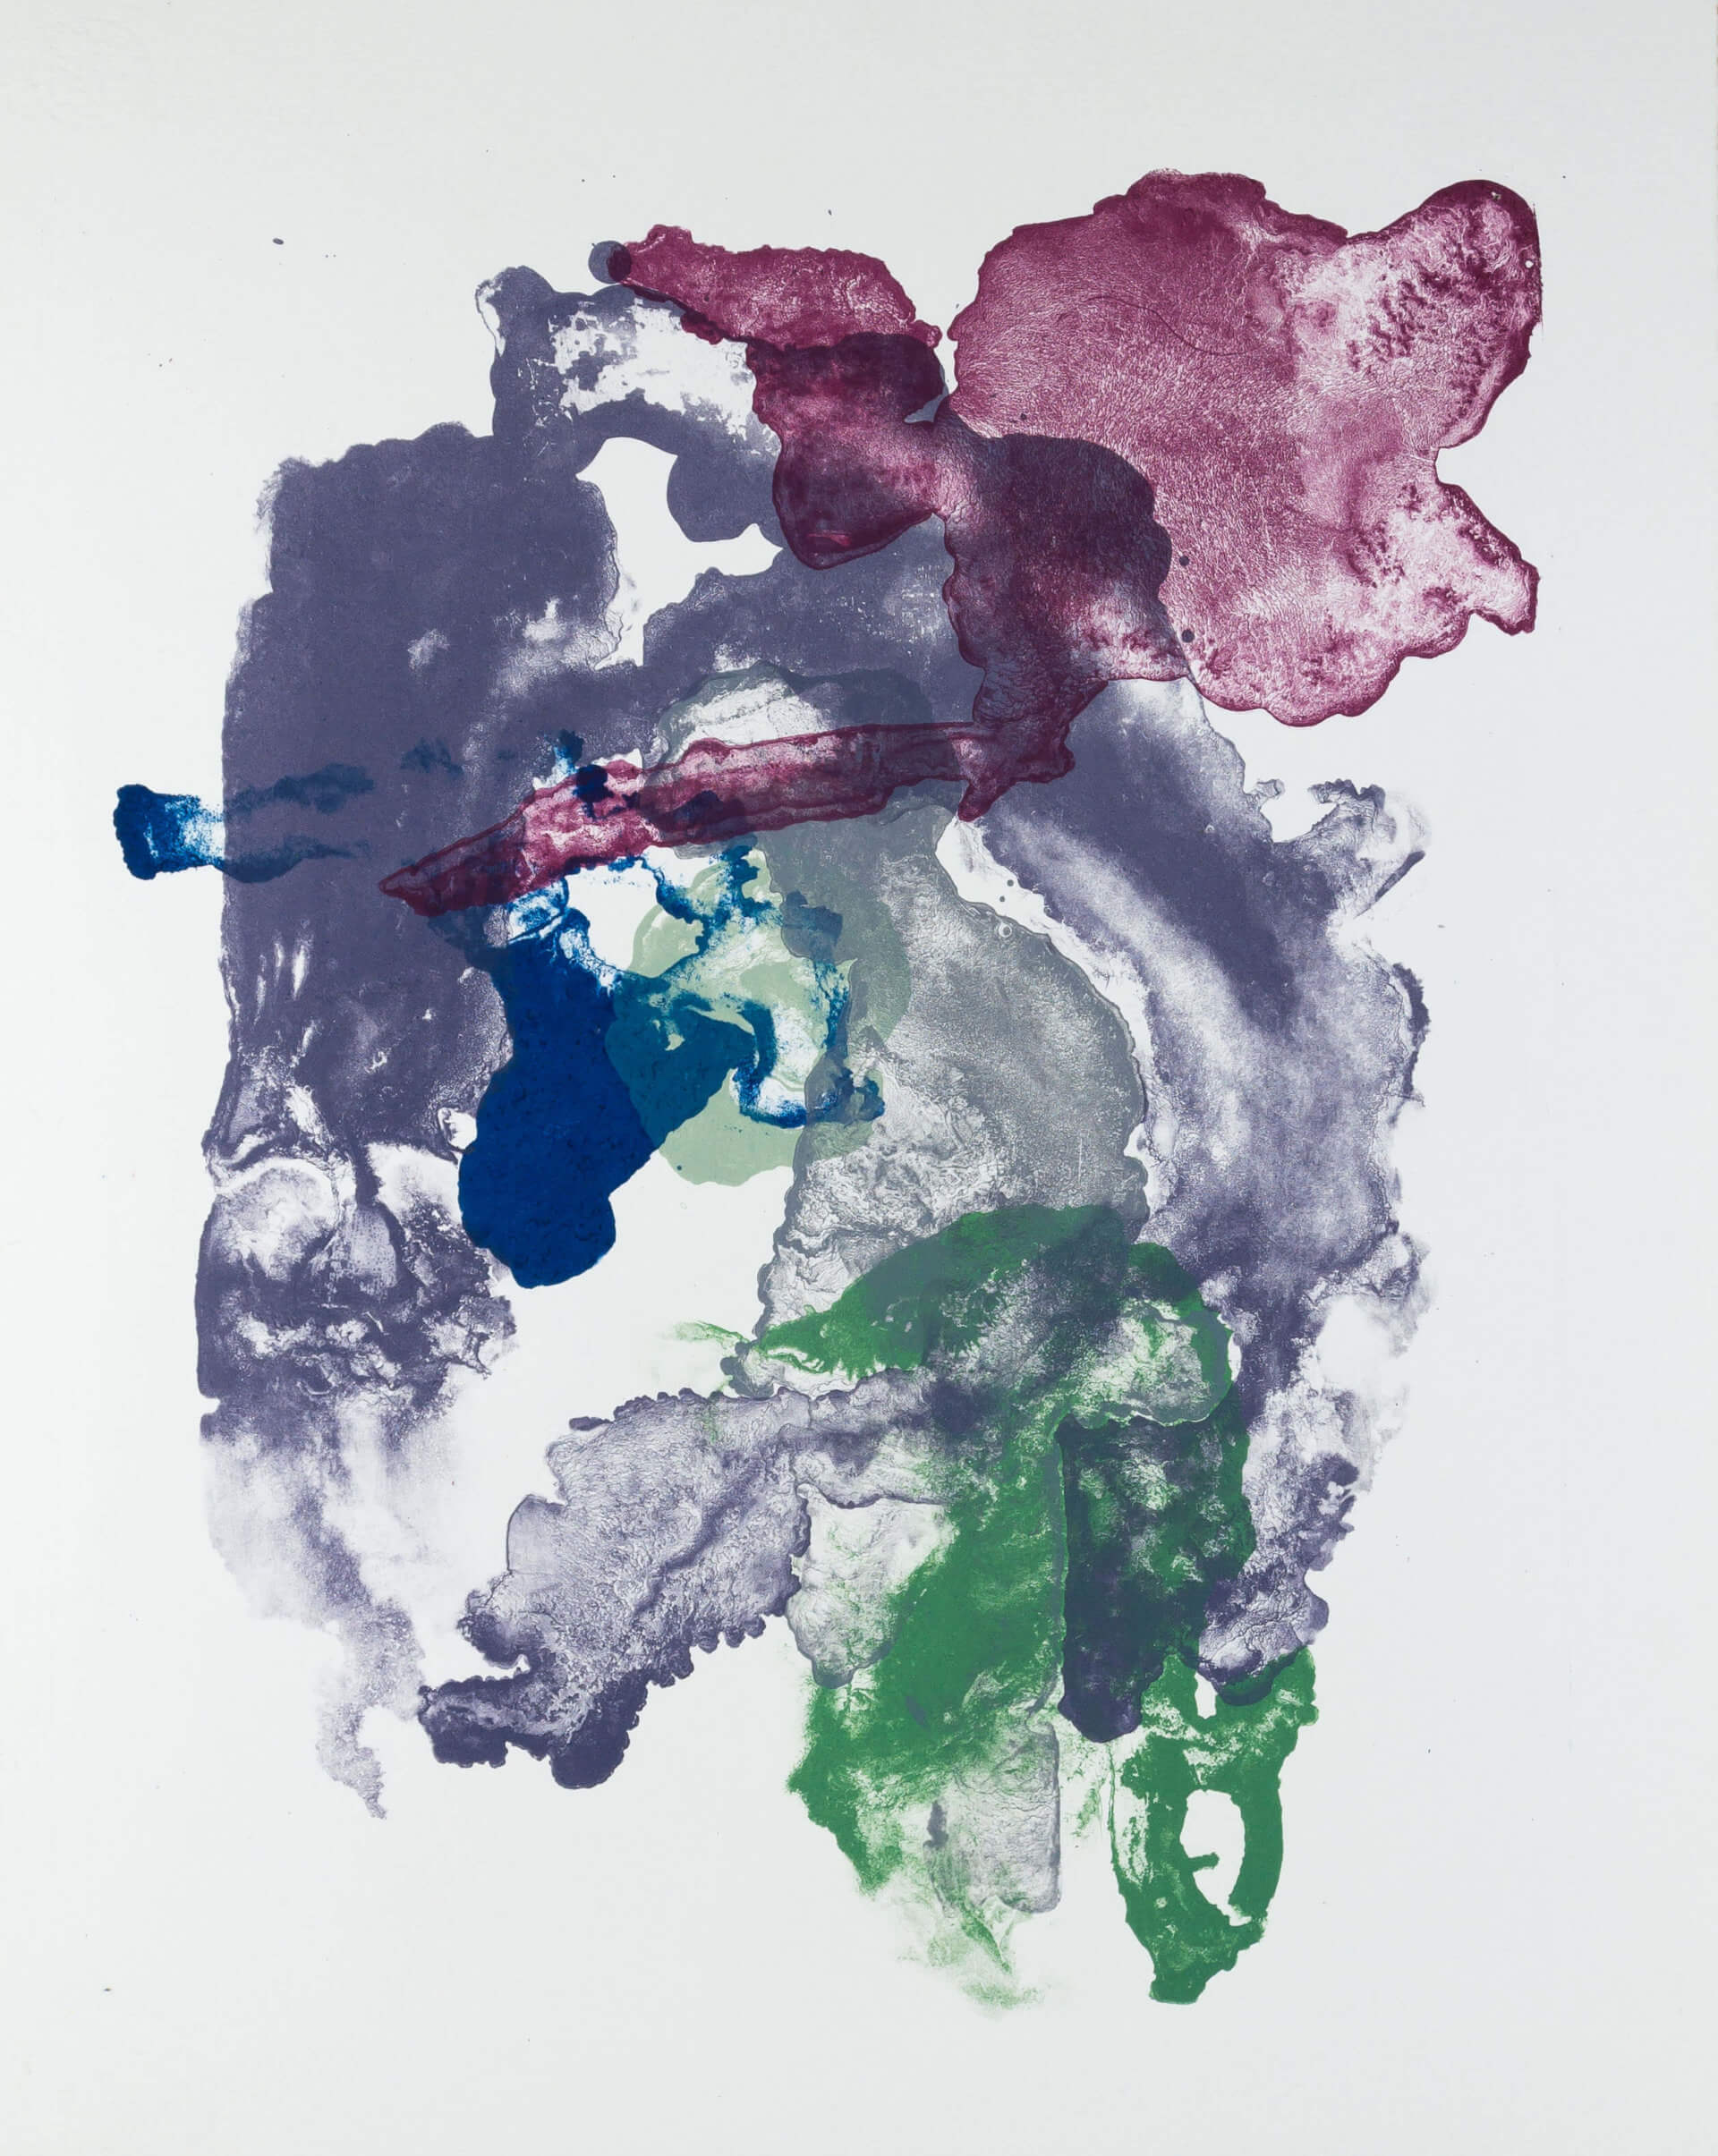 Katharina Albers, organism (growing)(F), 2017, Farblithographie, Unikat, 56x45 cm